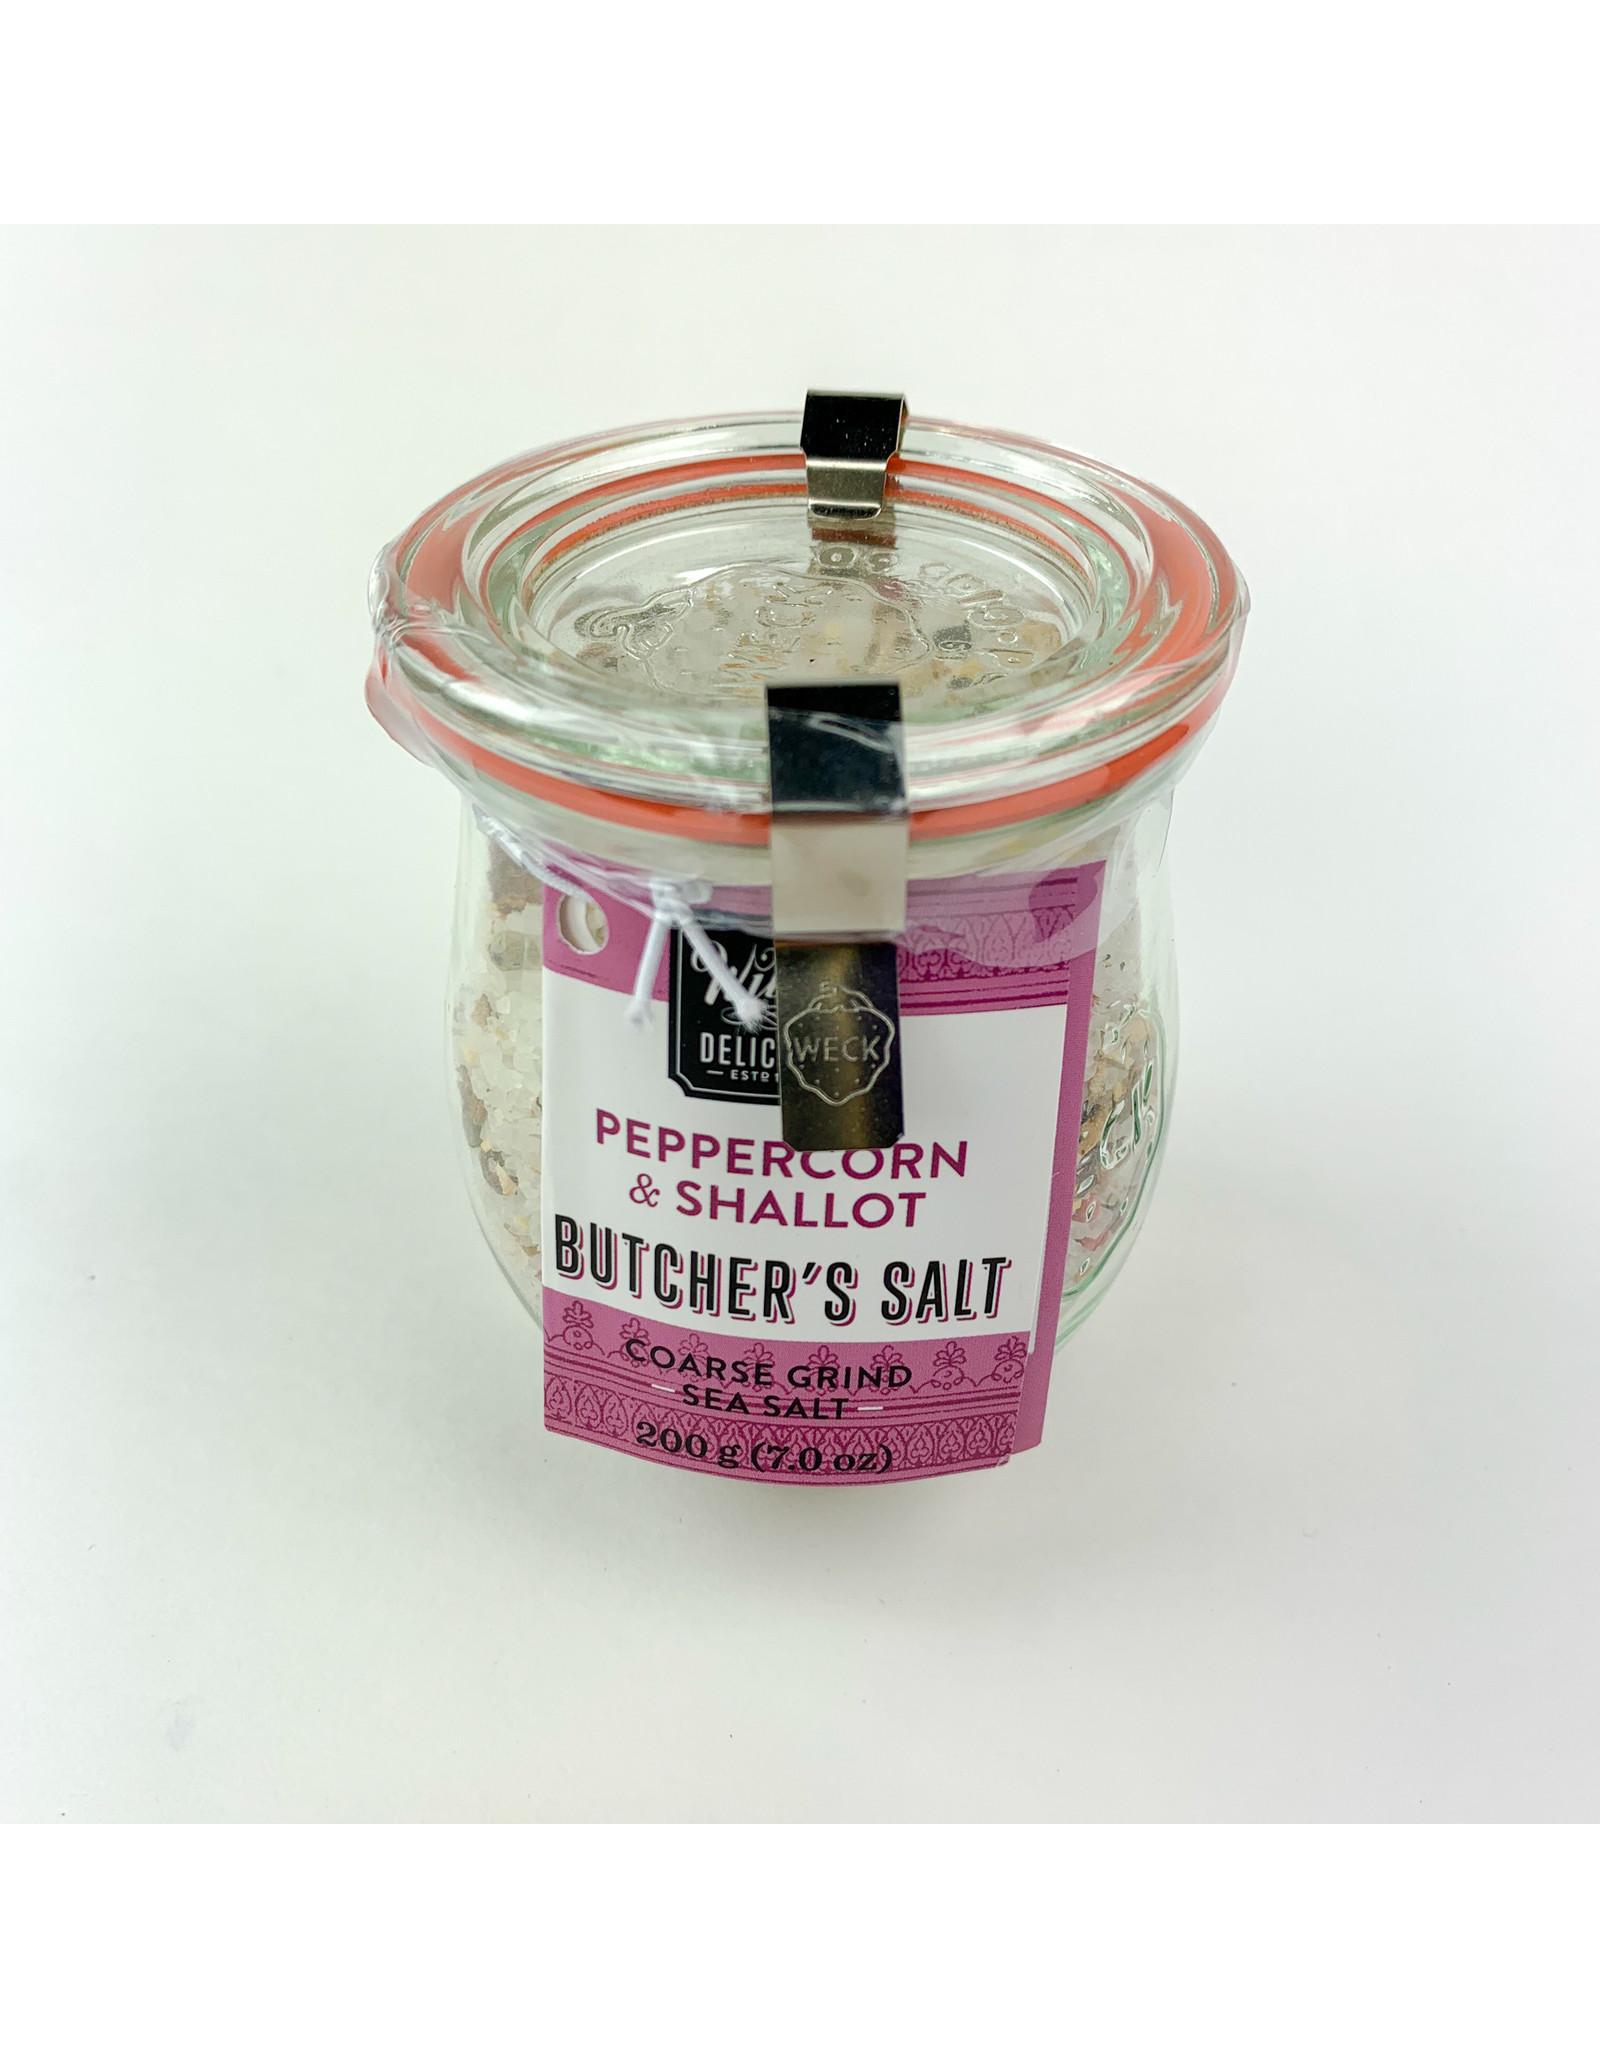 wildly delicious Peppercorn Shallot sea salt